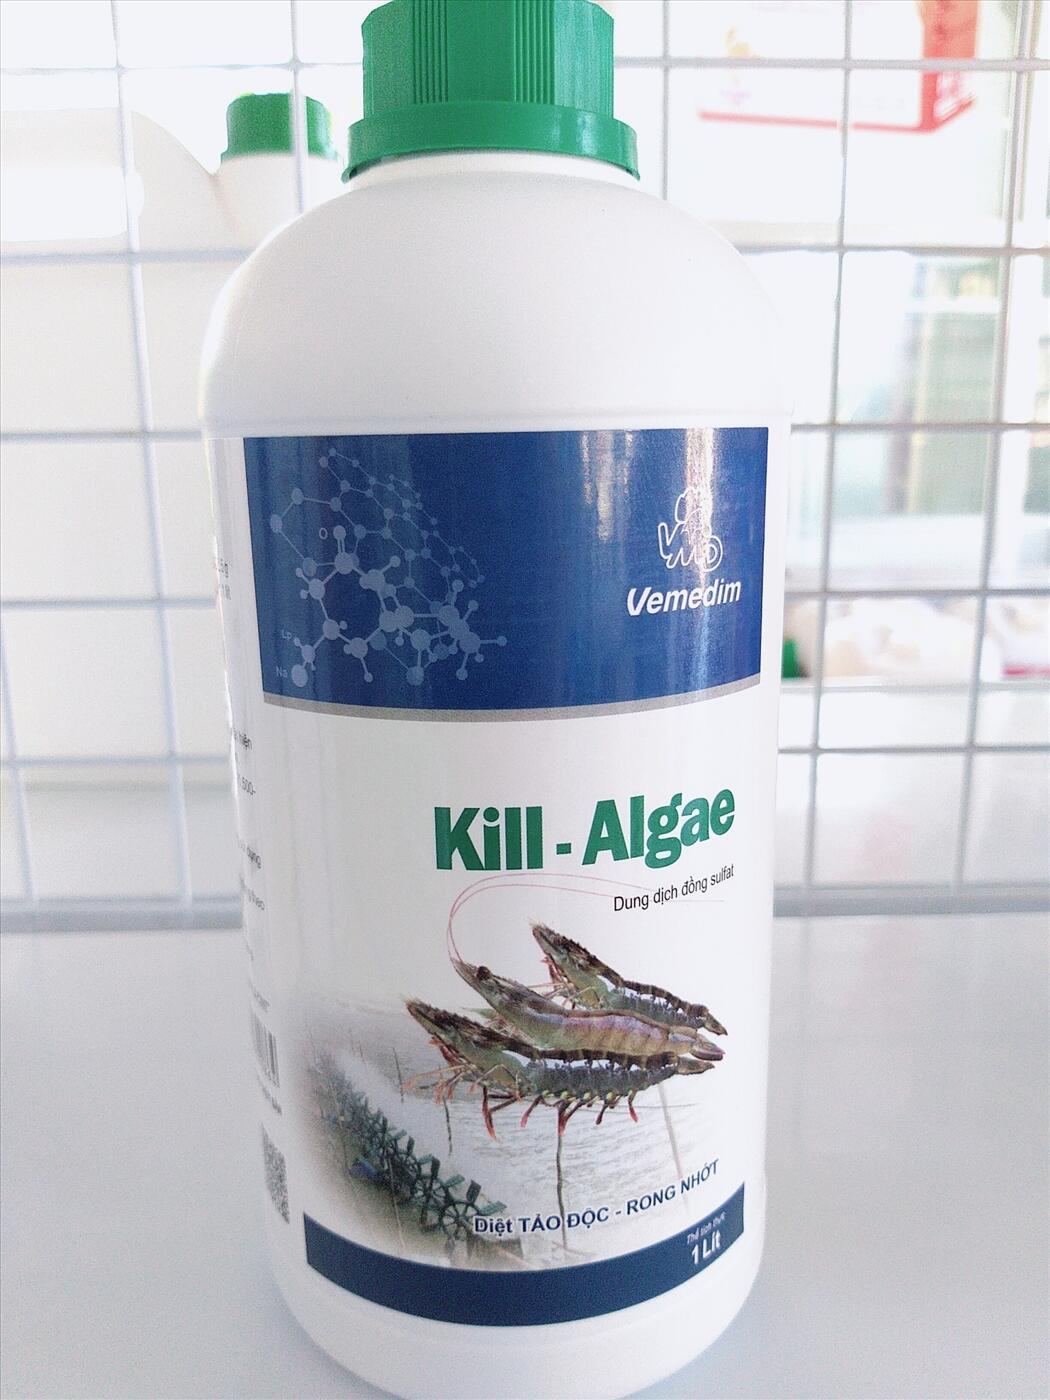 KILL ALGAE